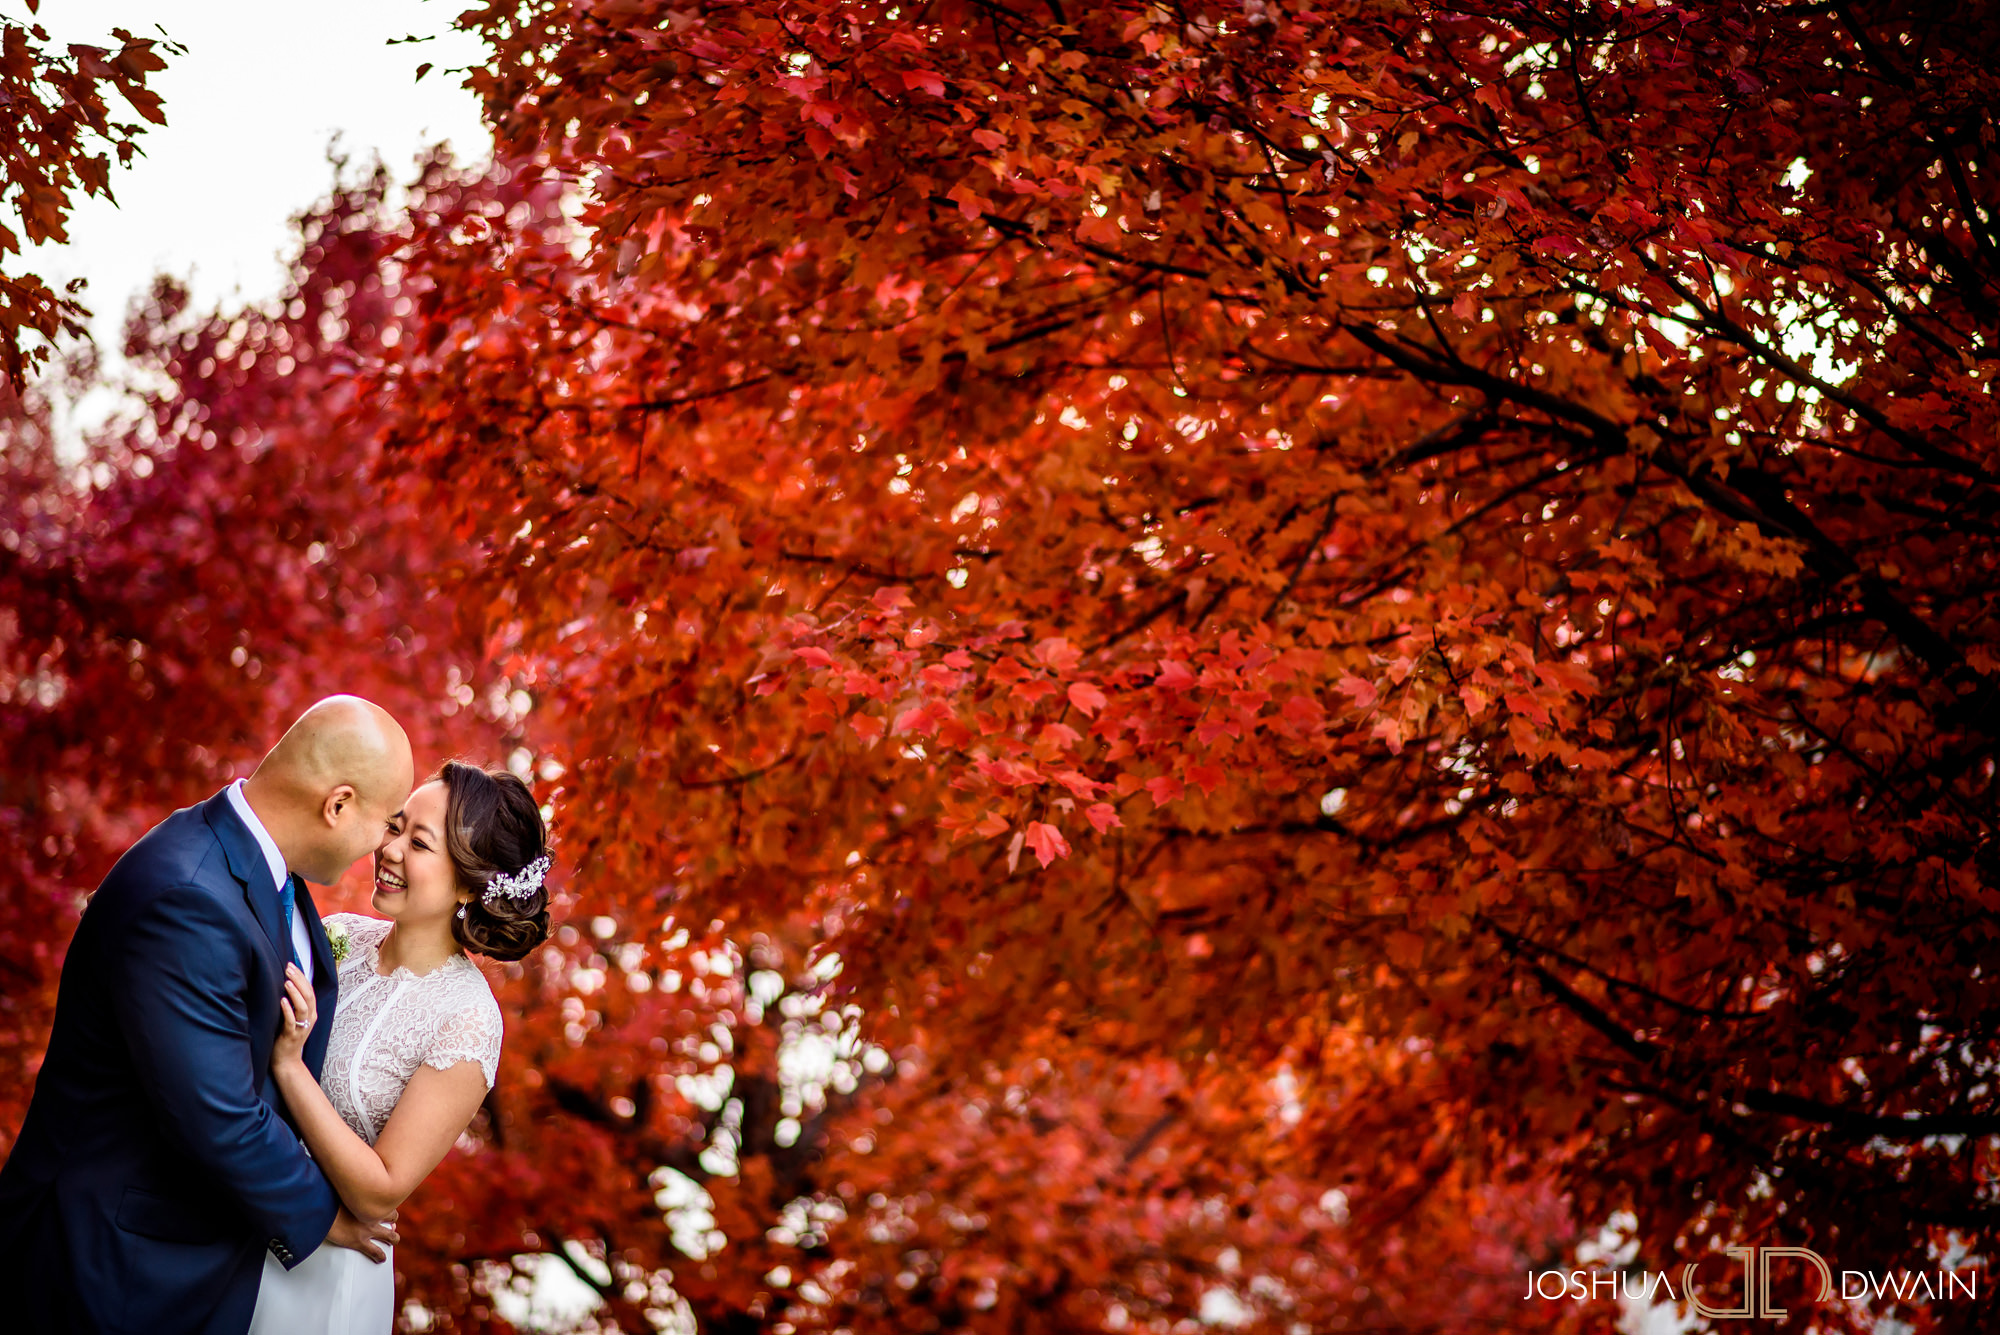 joshua-dwain-weddings-gallery-best-wedding-photographers-us-019